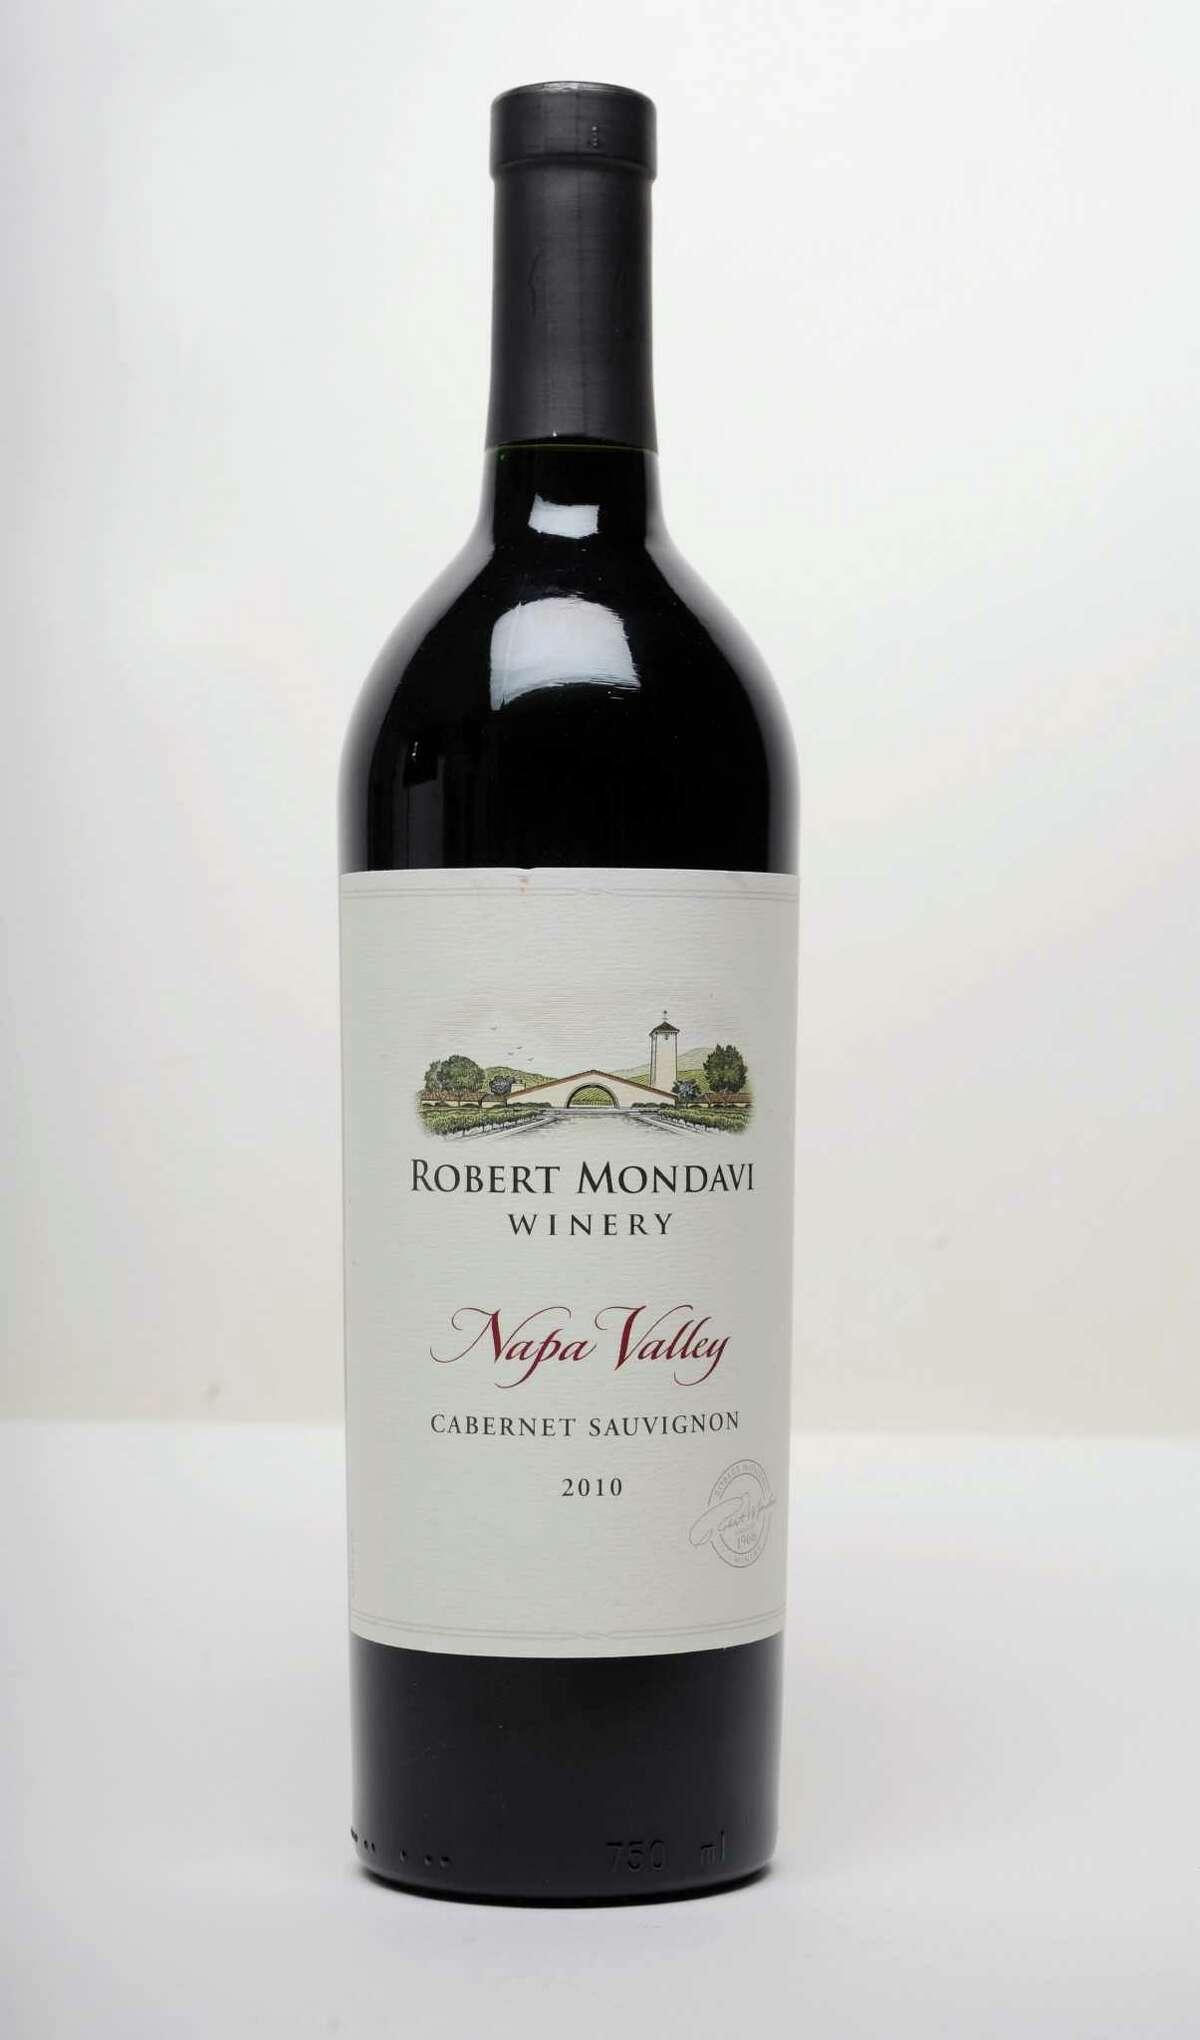 Robert Mondavi Winery Napa Valley Cabernet Sauvignon 2010 wine on Thursday, Sept. 26, 2013 in Colonie, N.Y. (Lori Van Buren / Times Union)